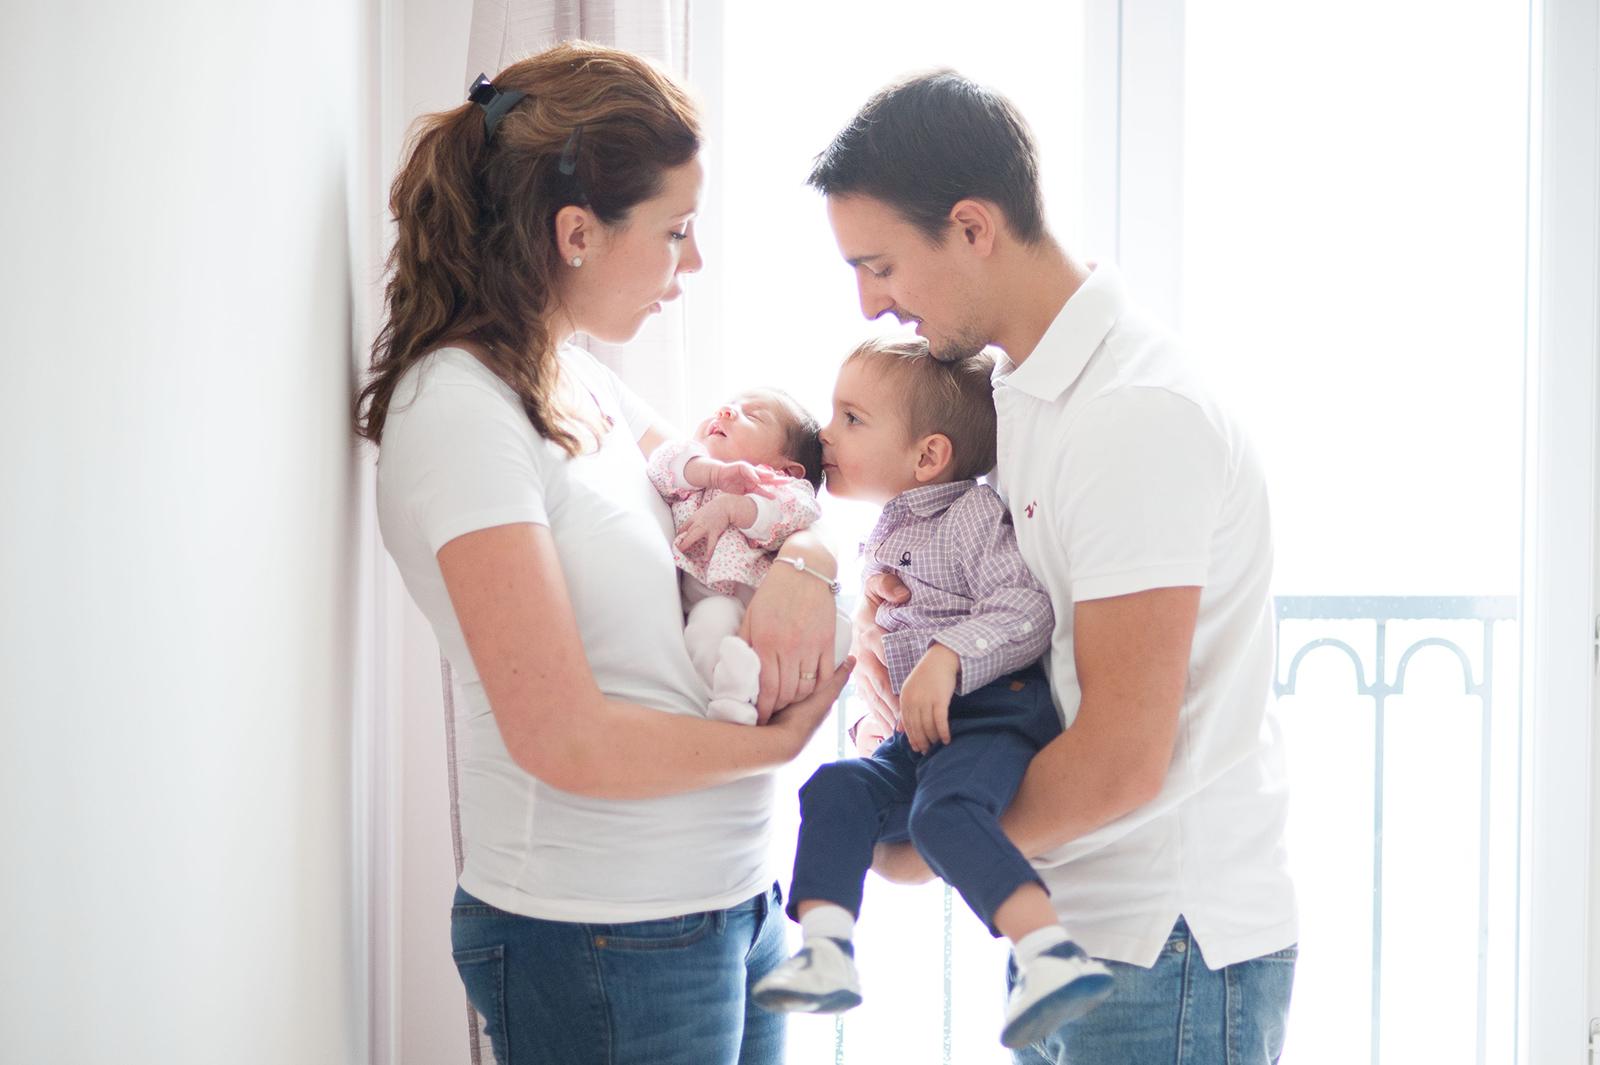 seance-photo-famille-photo-grossesse-photo-bébé-naissance-sabrina-godemert-photographe-seine-et-marne024